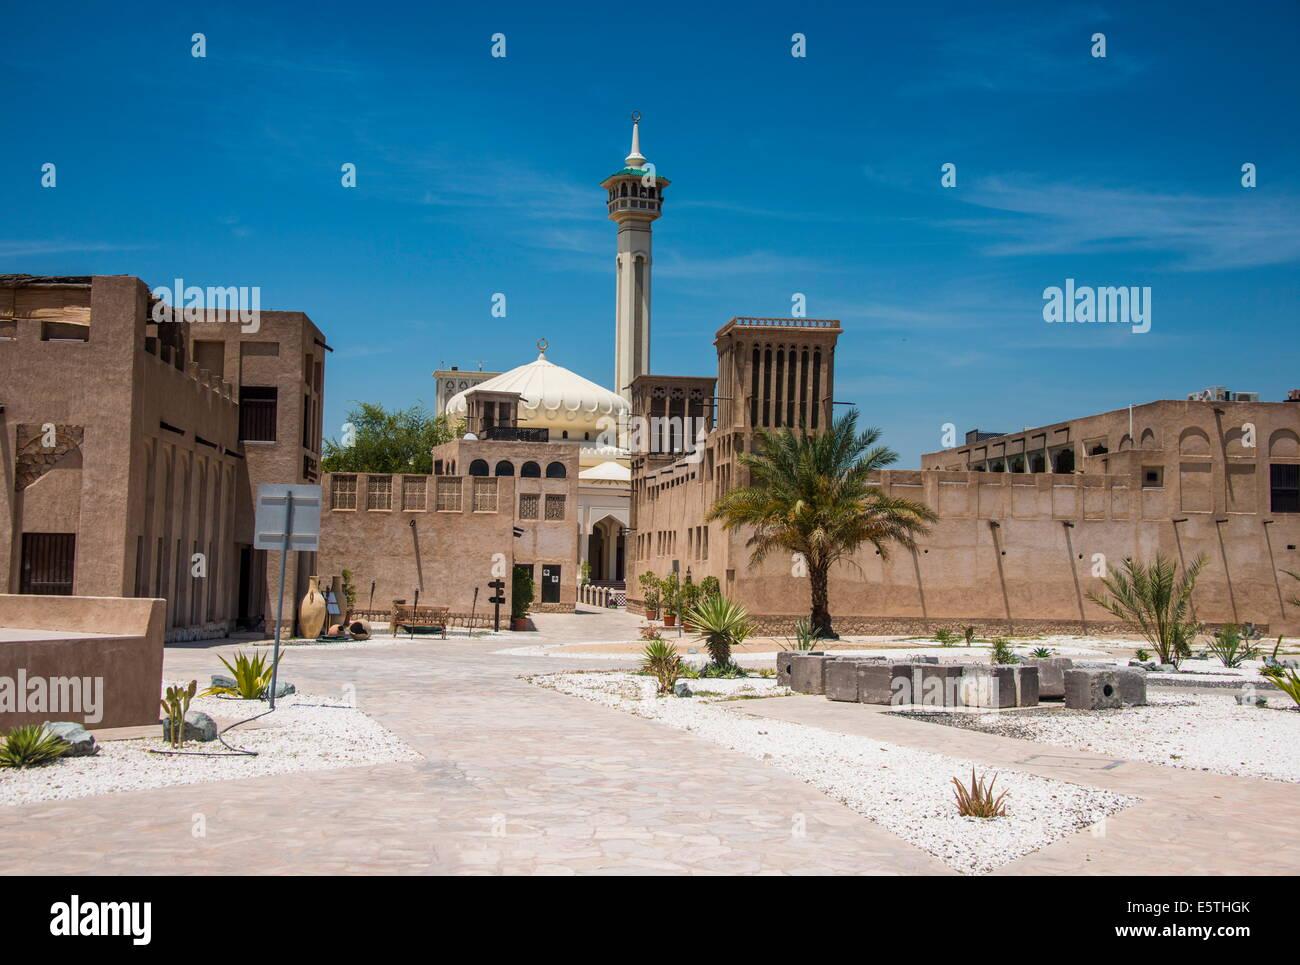 Entrance to the Bur Dubai souk of Dubai, United Arab Emirates, Middle East - Stock Image